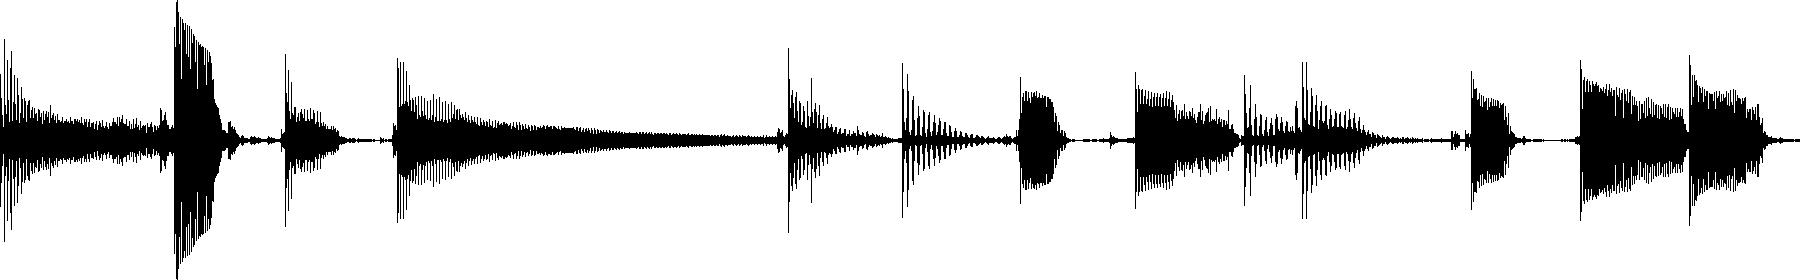 Bass 20fhp slap 20riff 204 125 d